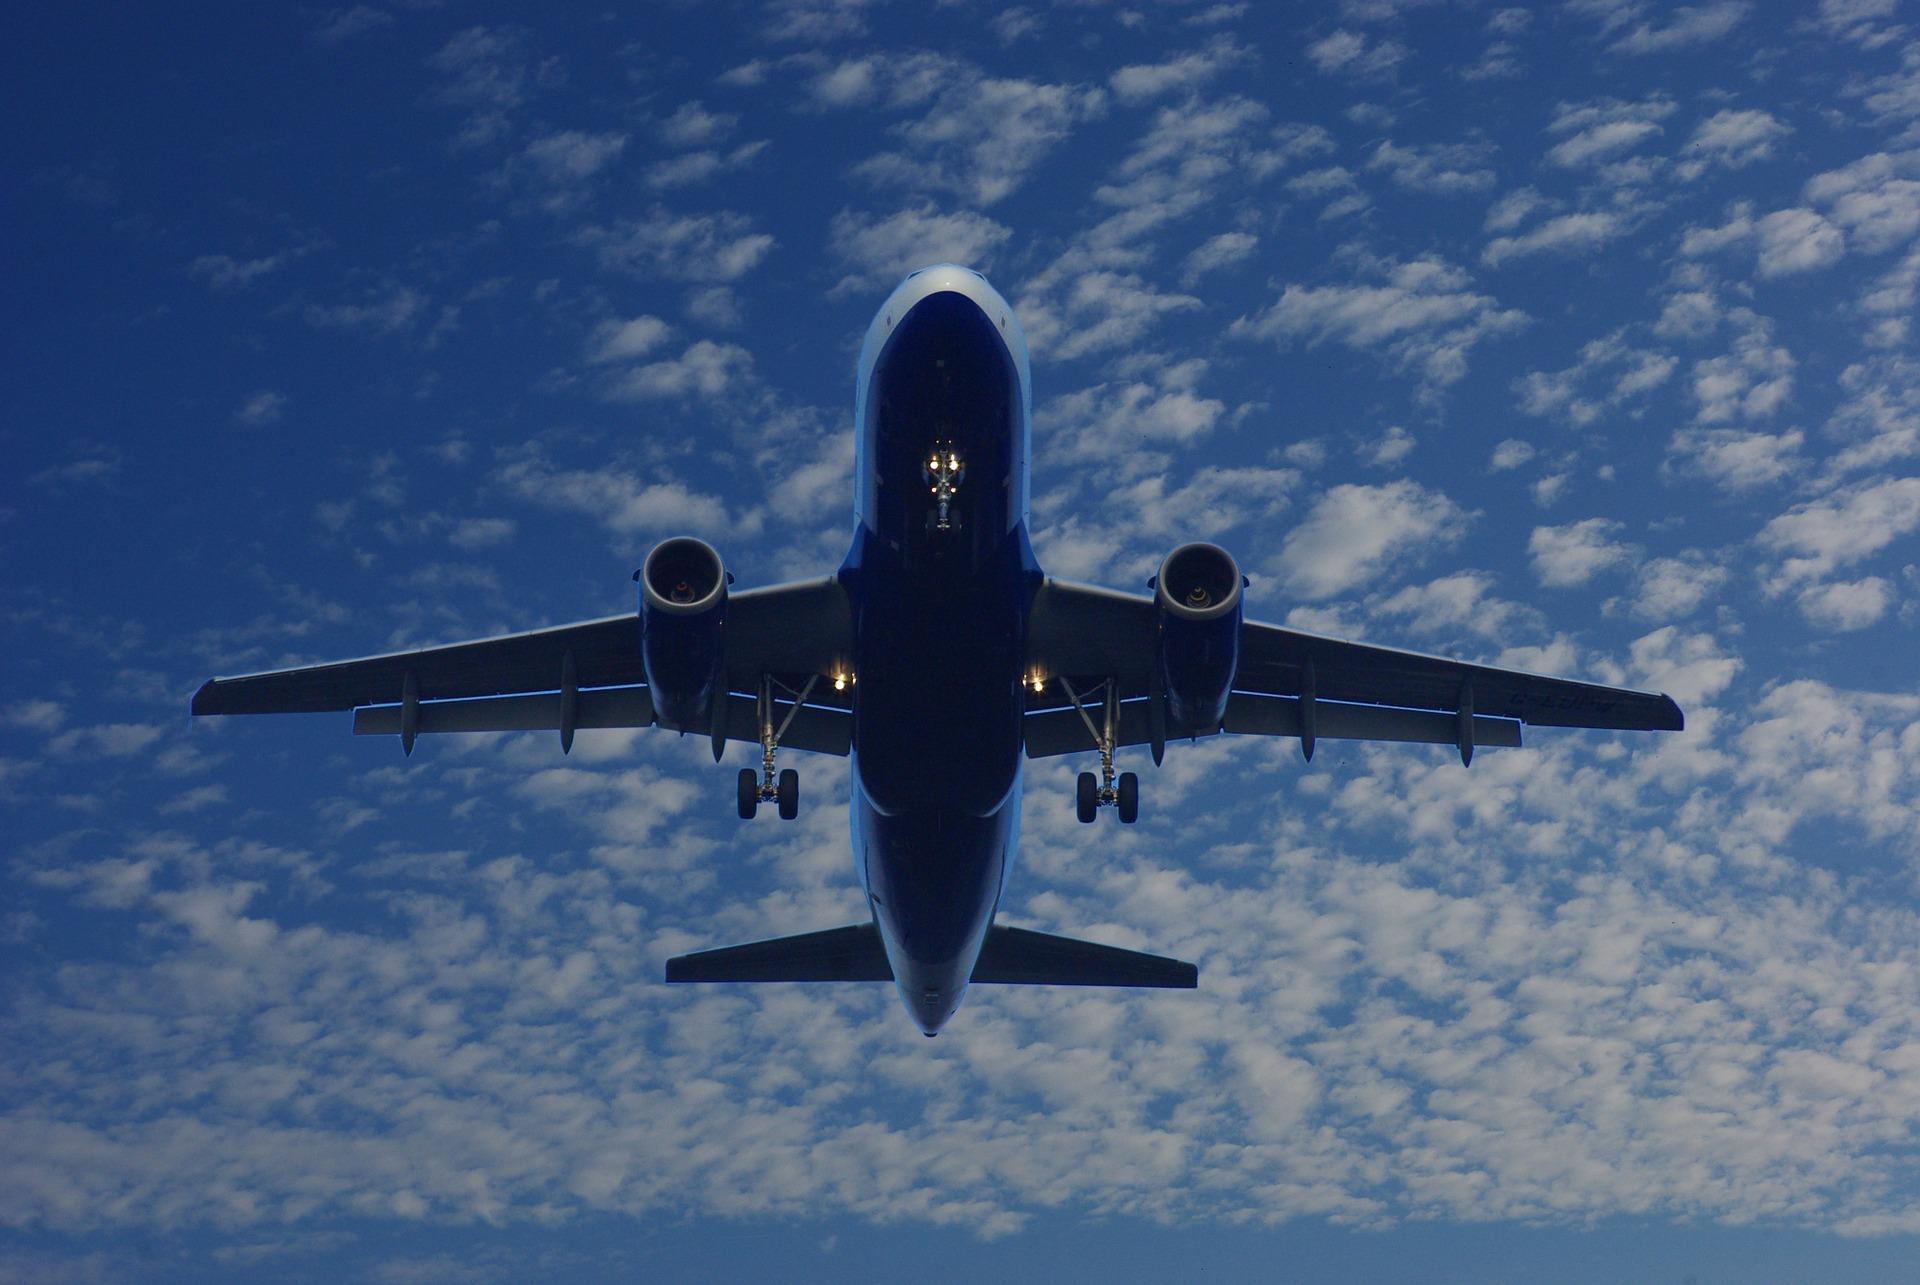 Luftfracht - Flugzeug